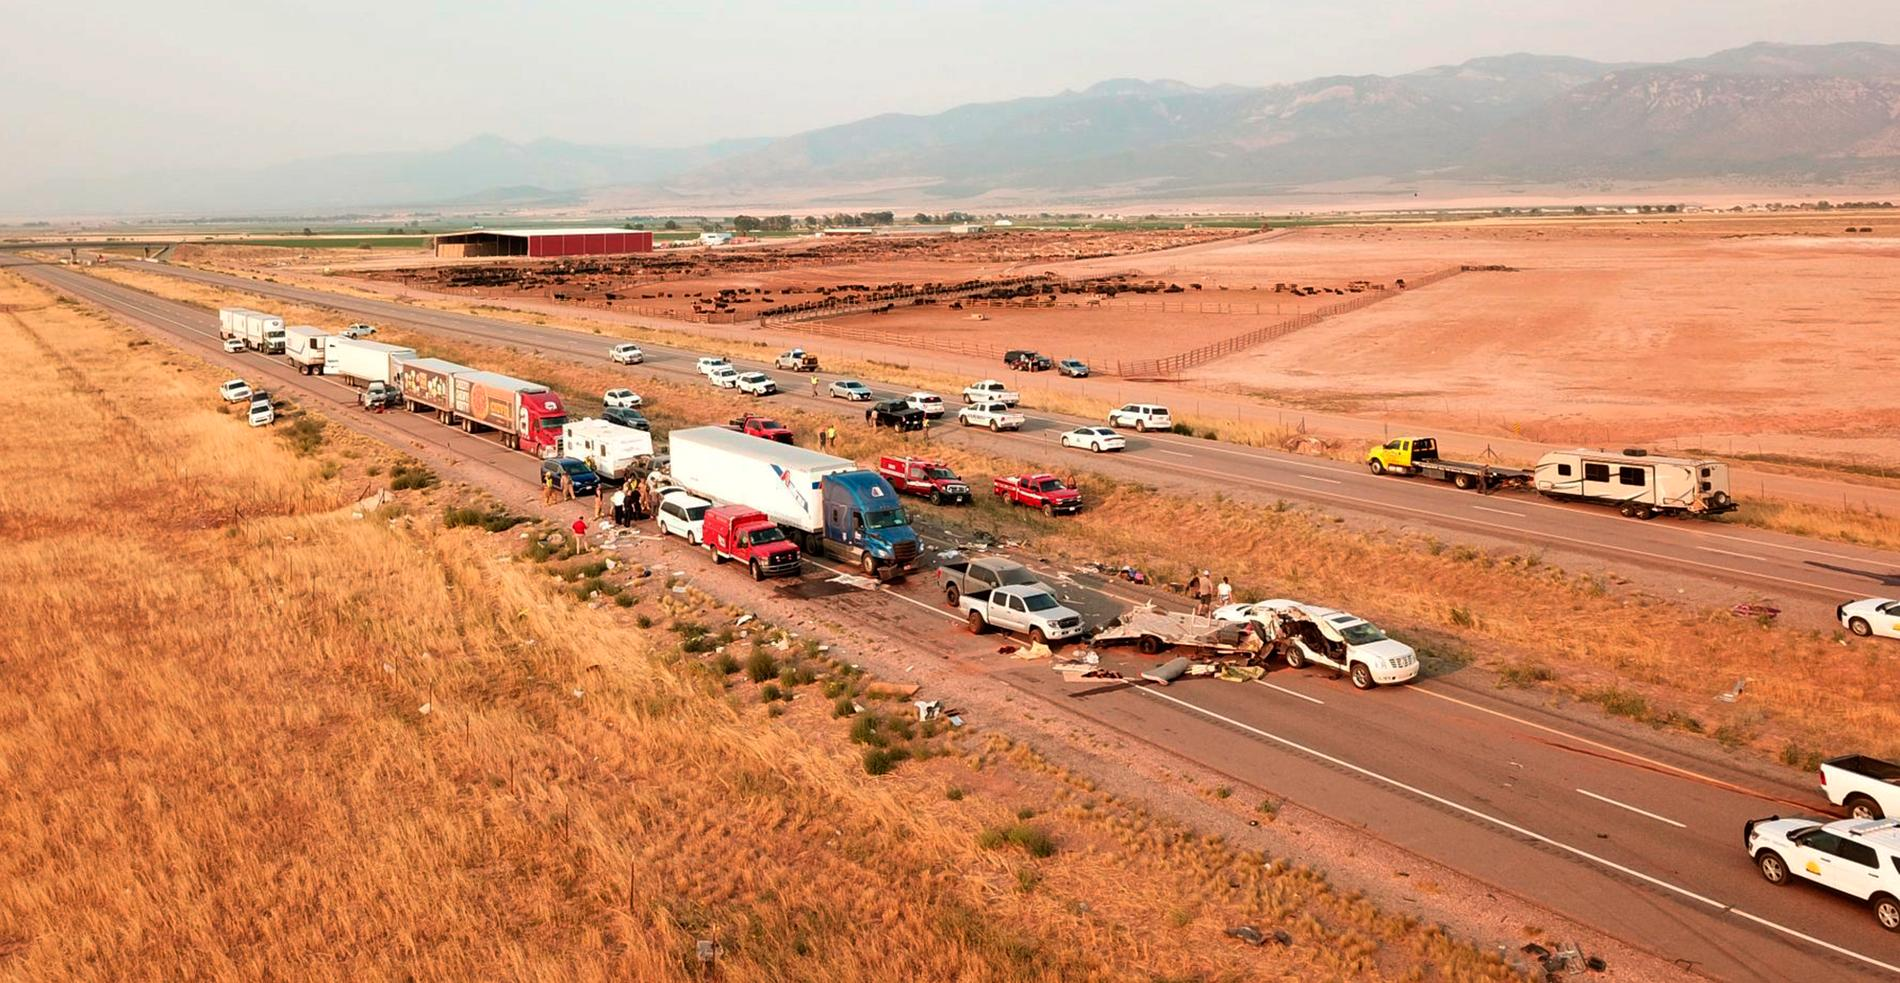 Minst sju personer har omkommit i en stor seriekrock i Utah.